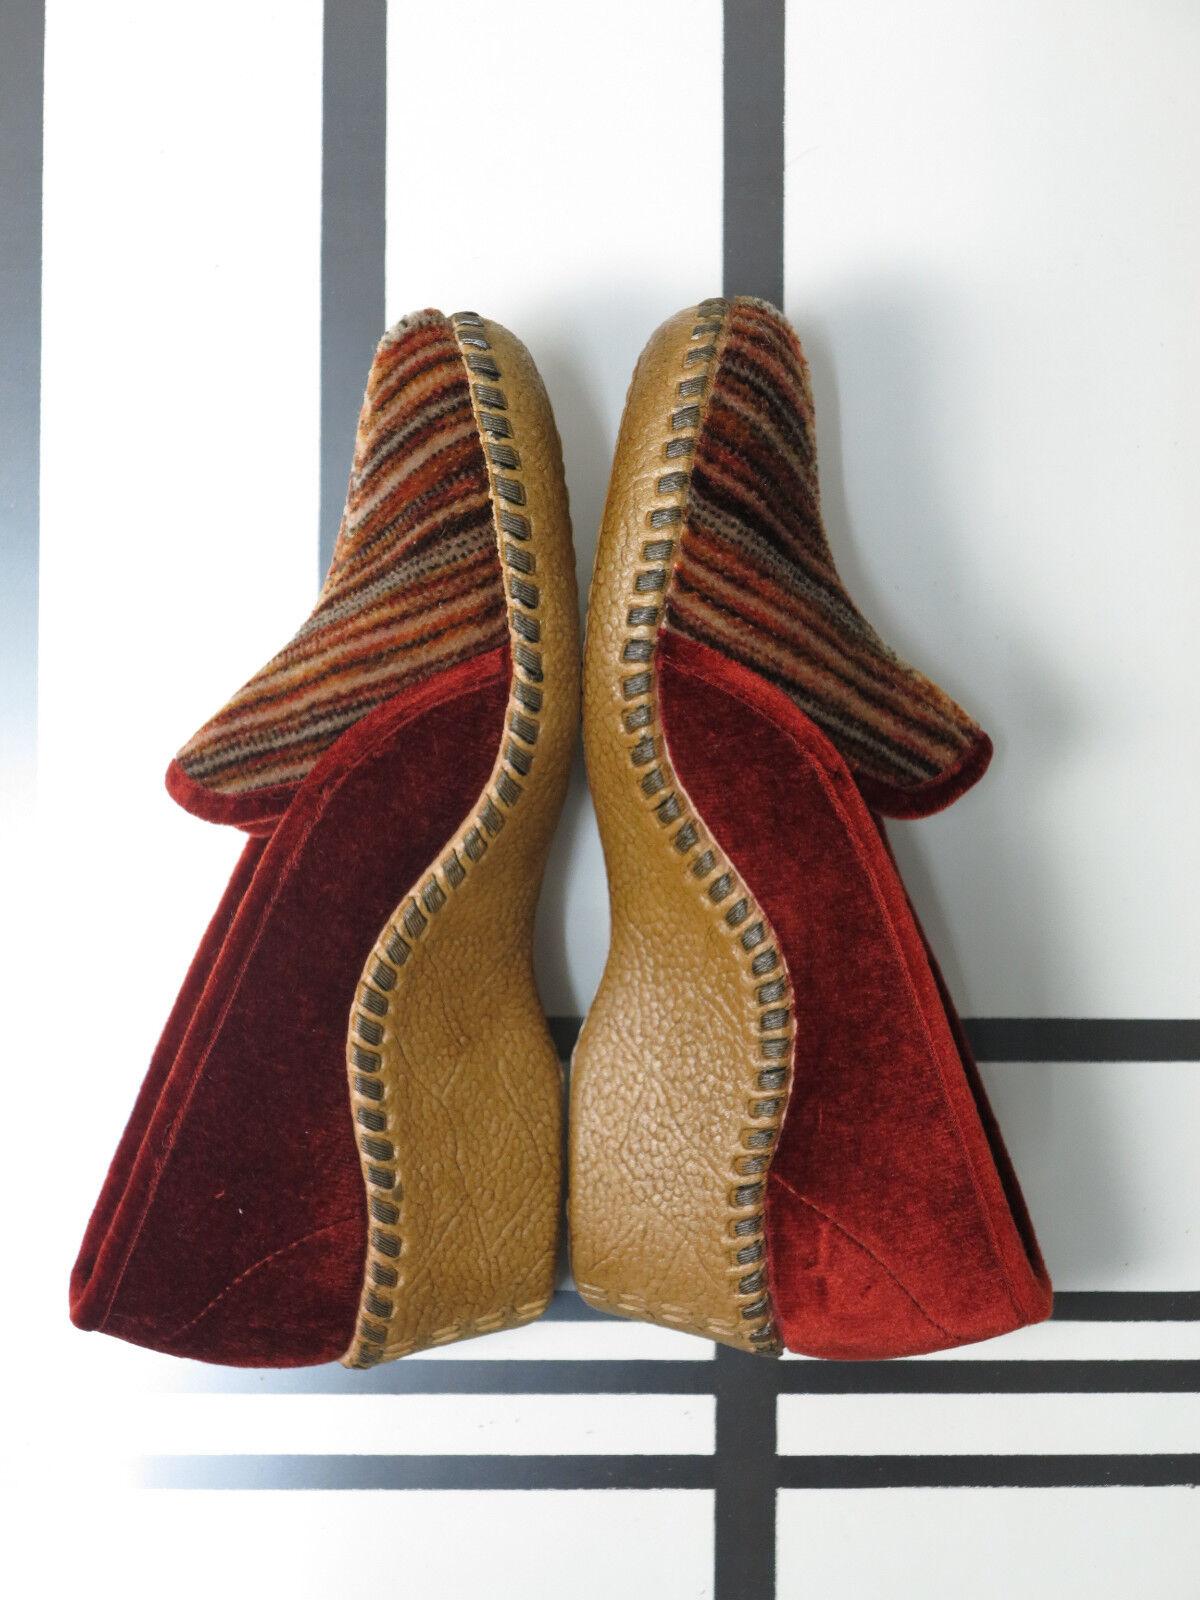 Kiel DIADEM Damen Slipper Hausschuhe 70er TRUE VINTAGE 70s house schuhe slippers